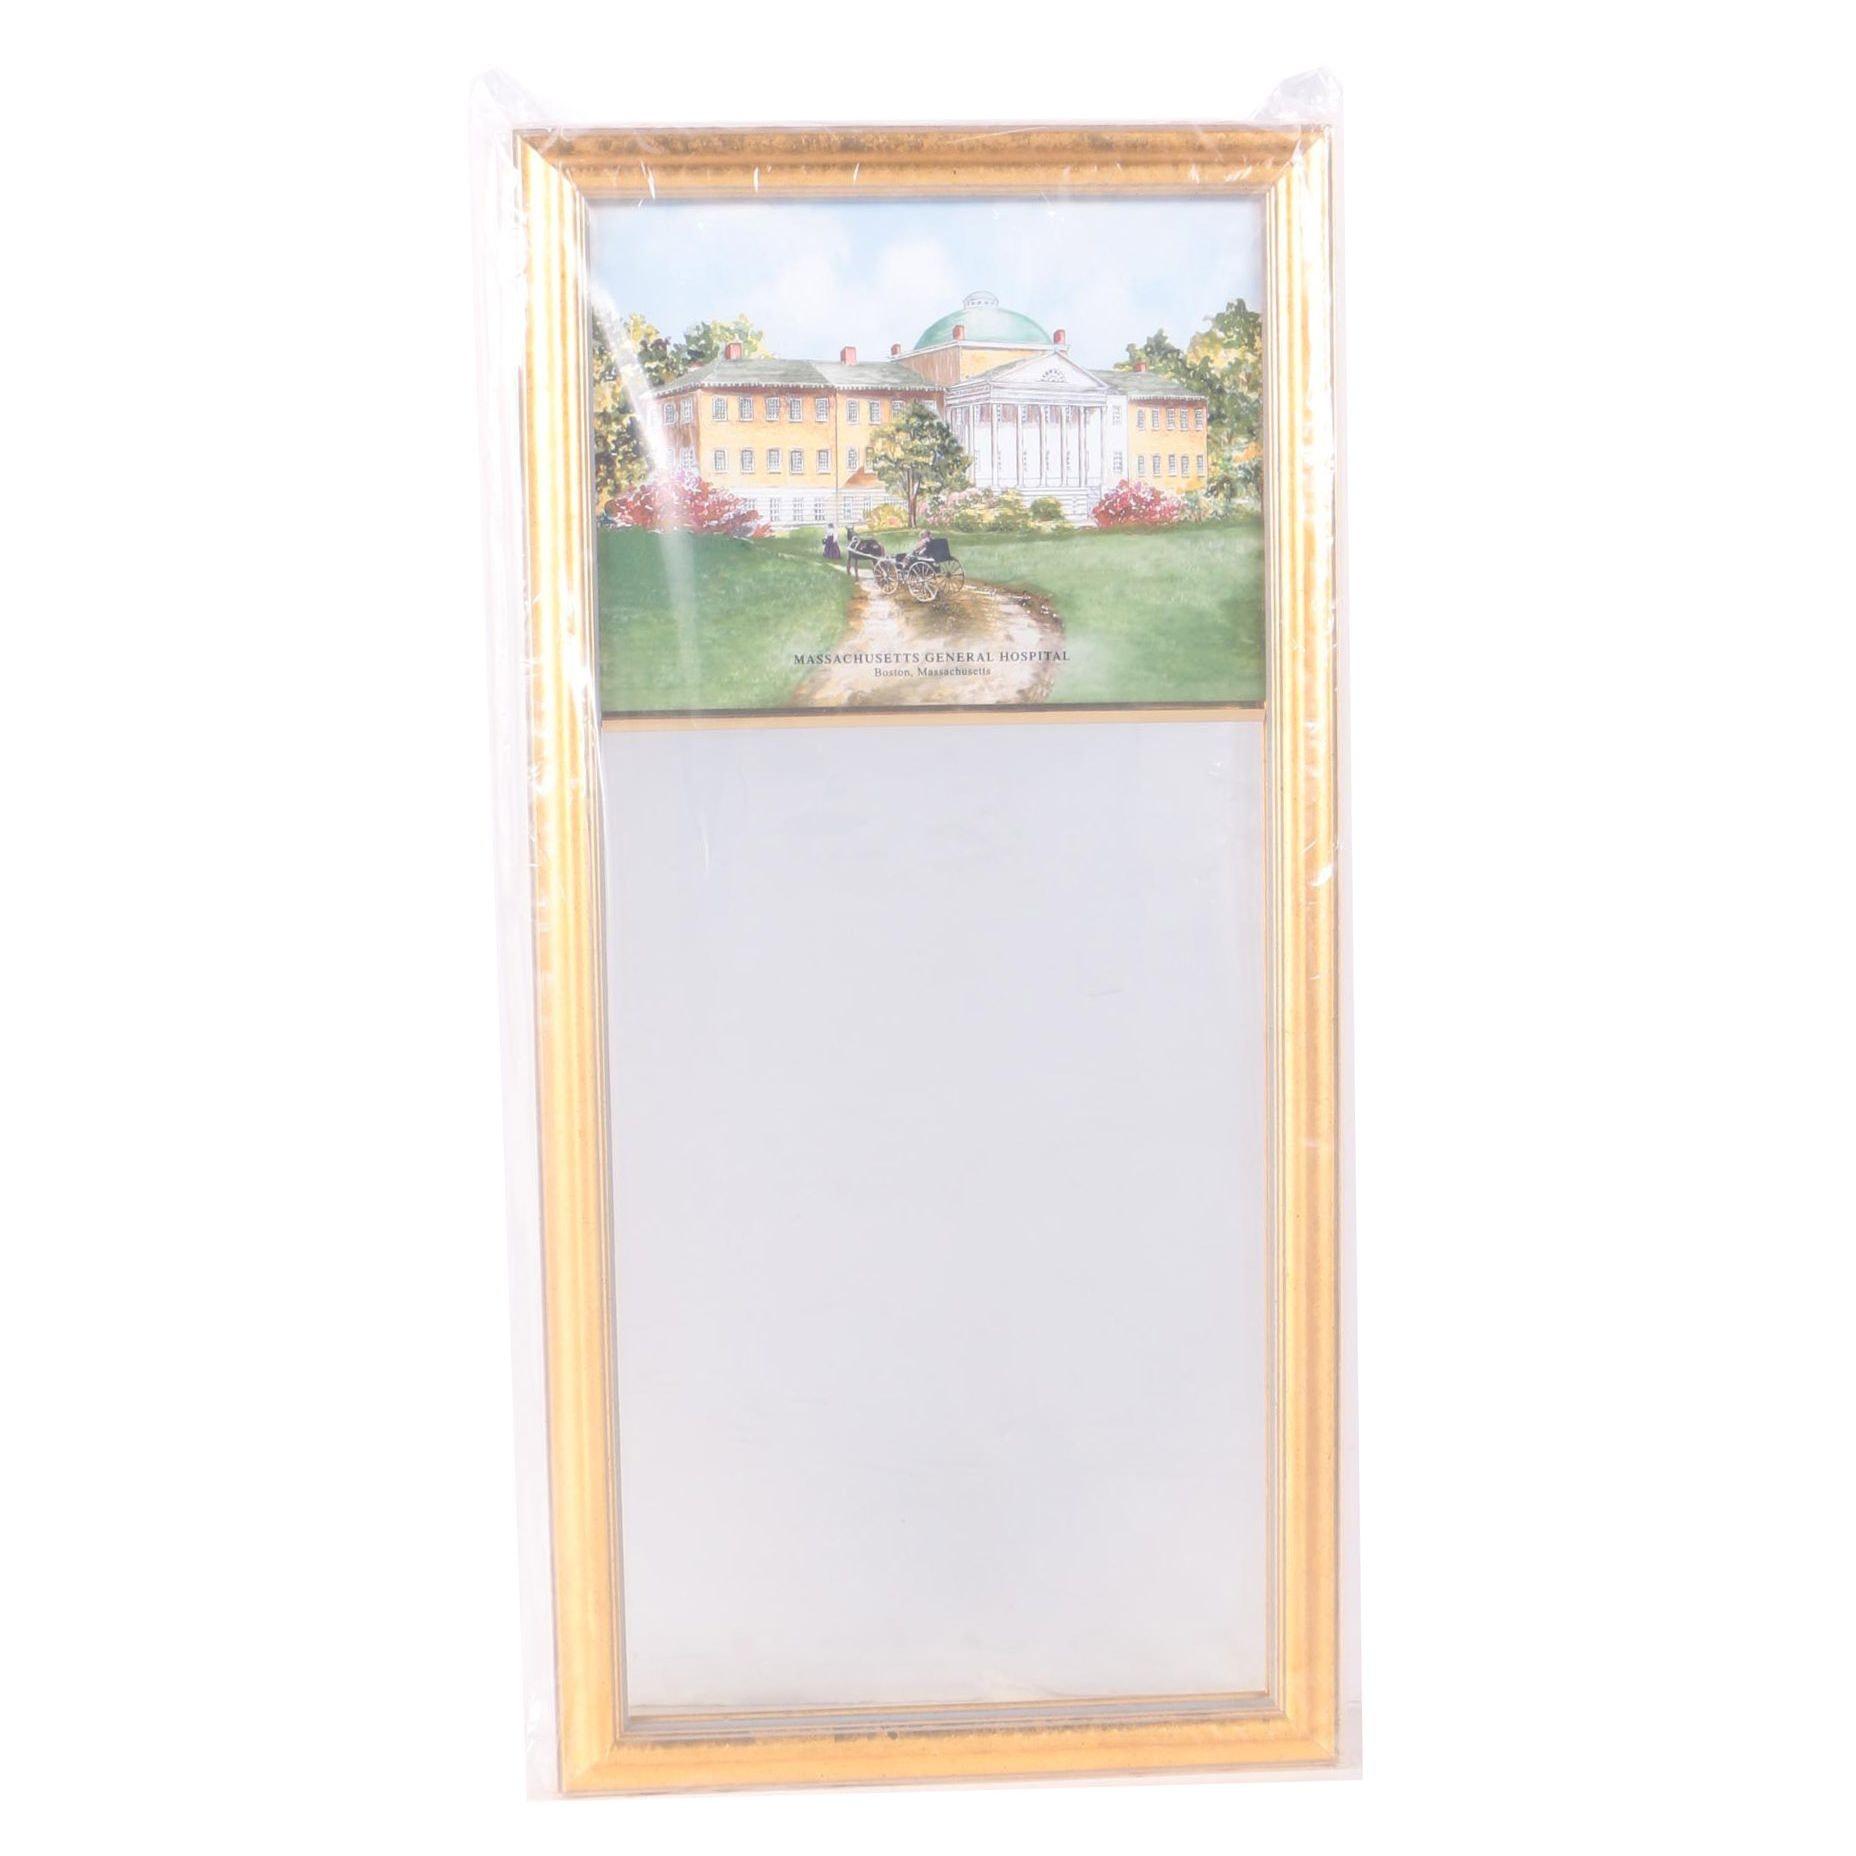 "Decorative Wall Mirror Eglomise ""Massachusetts General Hospital"""